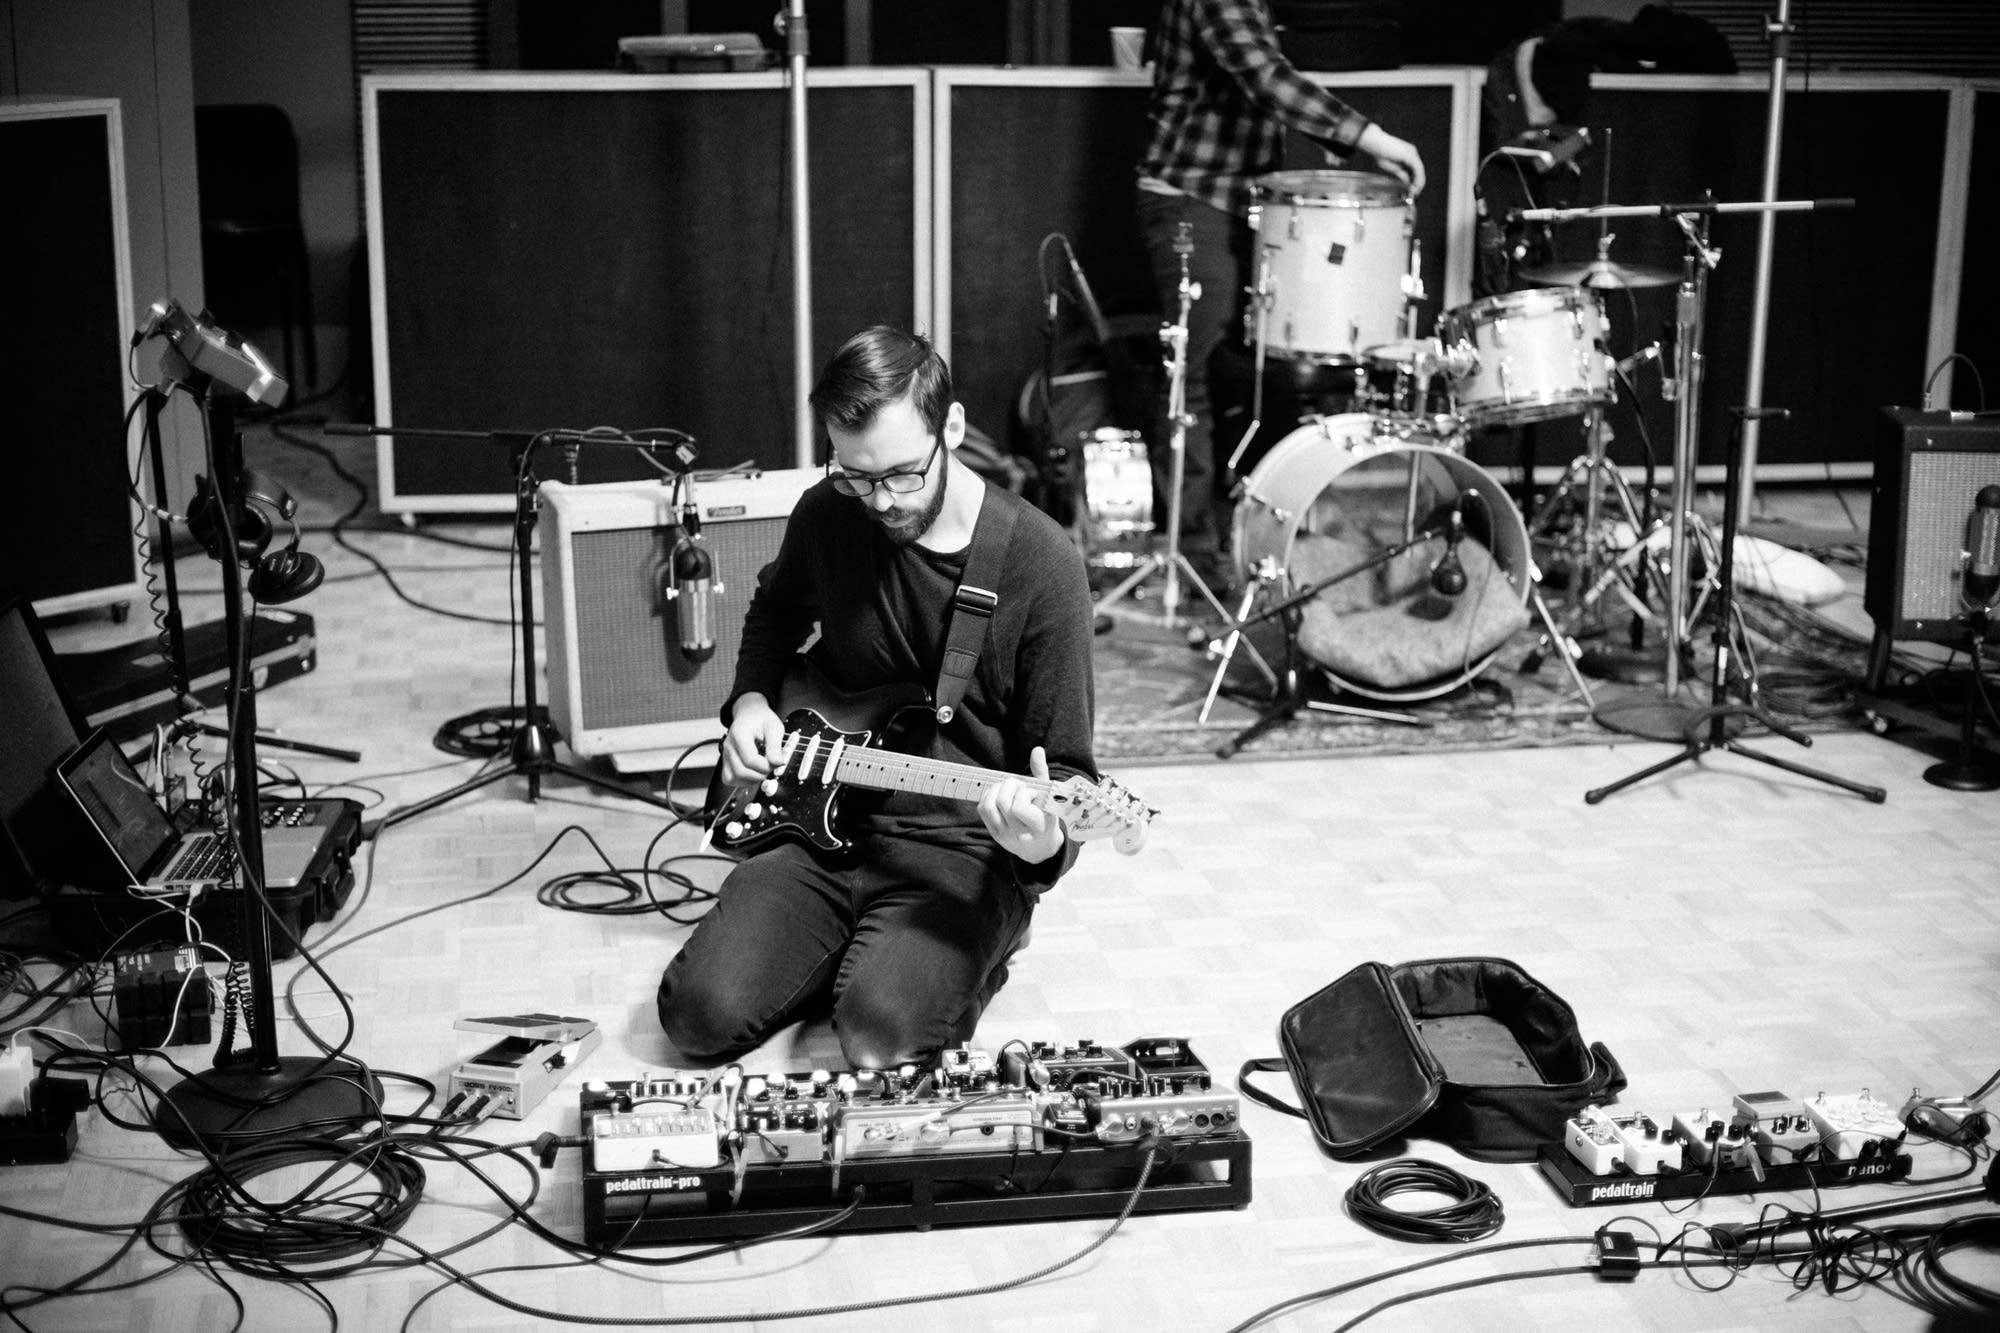 Jacob Blizard in The Current's studio